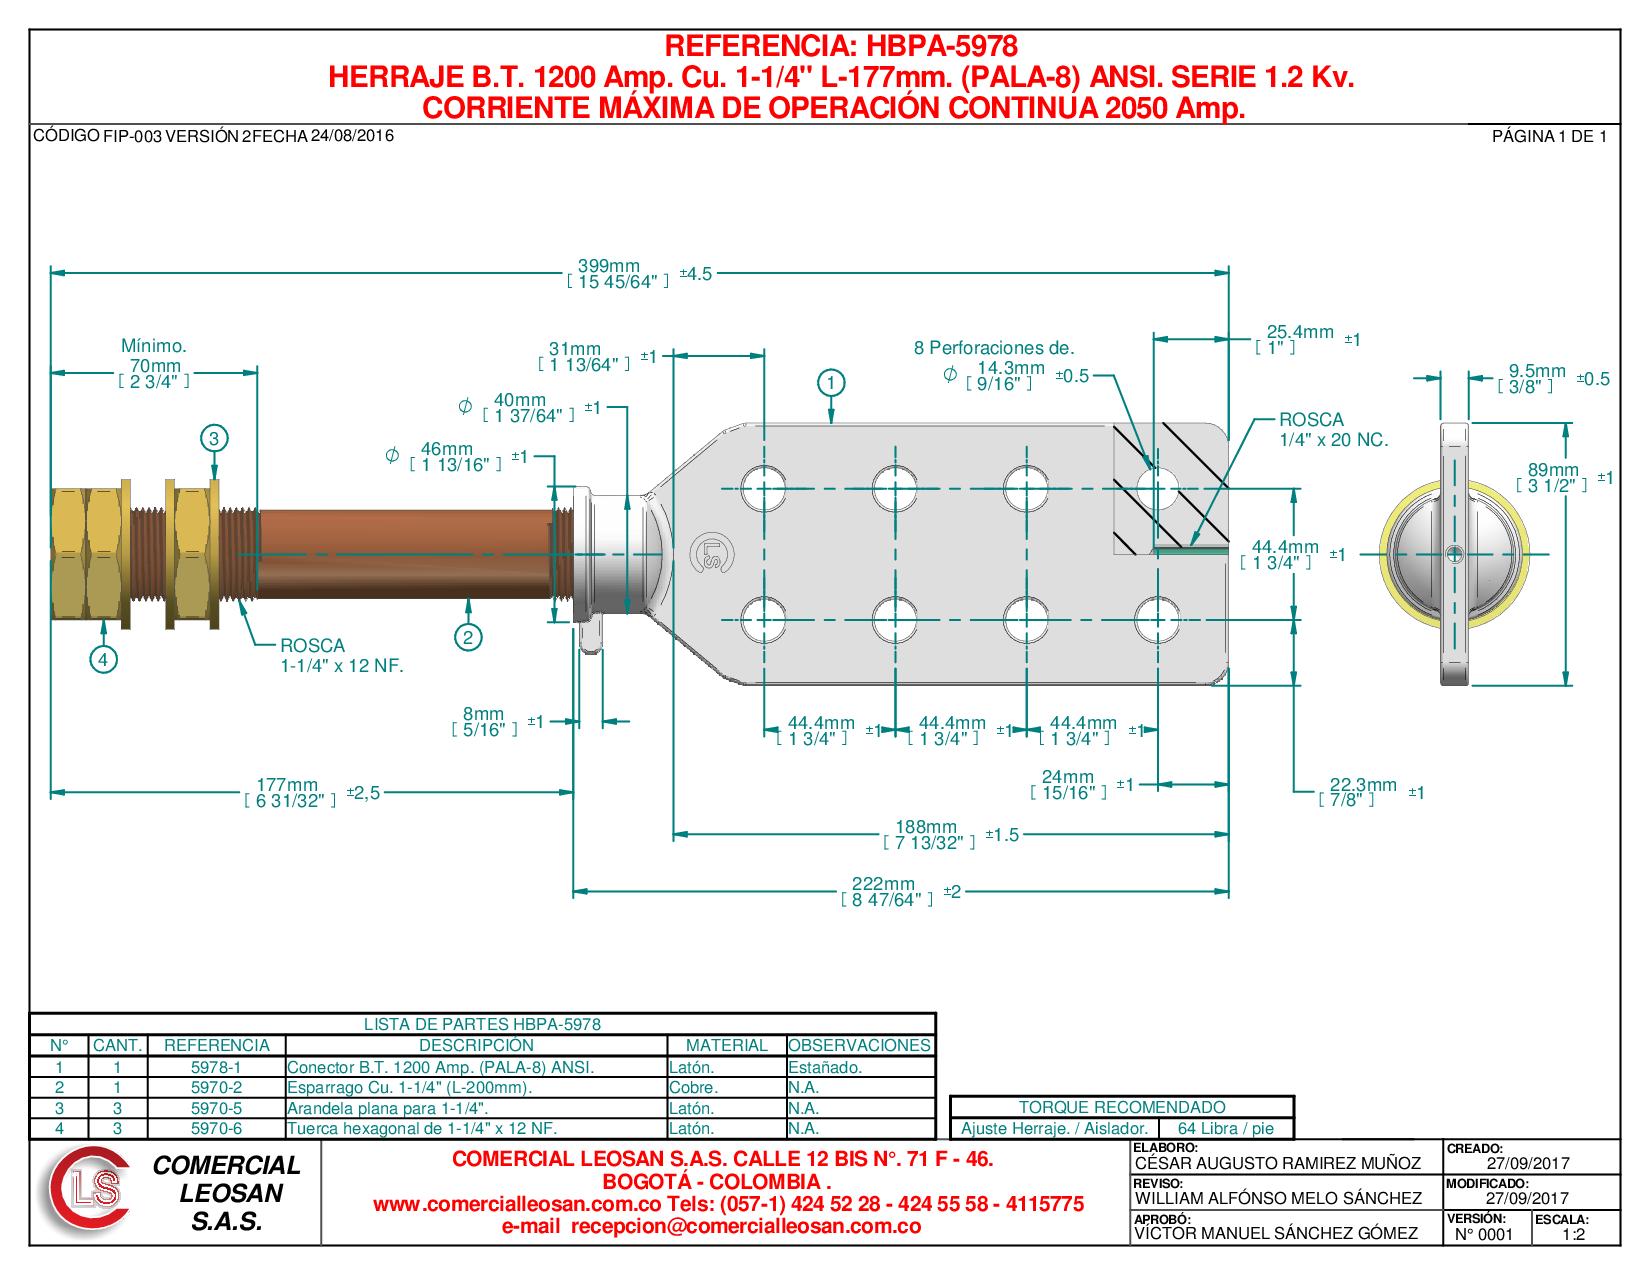 "HERRAJE B.T. 1200 Amp. Cu. 1-1/4"" L-177mm. (PALA-8) ANSI. SERIE 1,2 Kv."